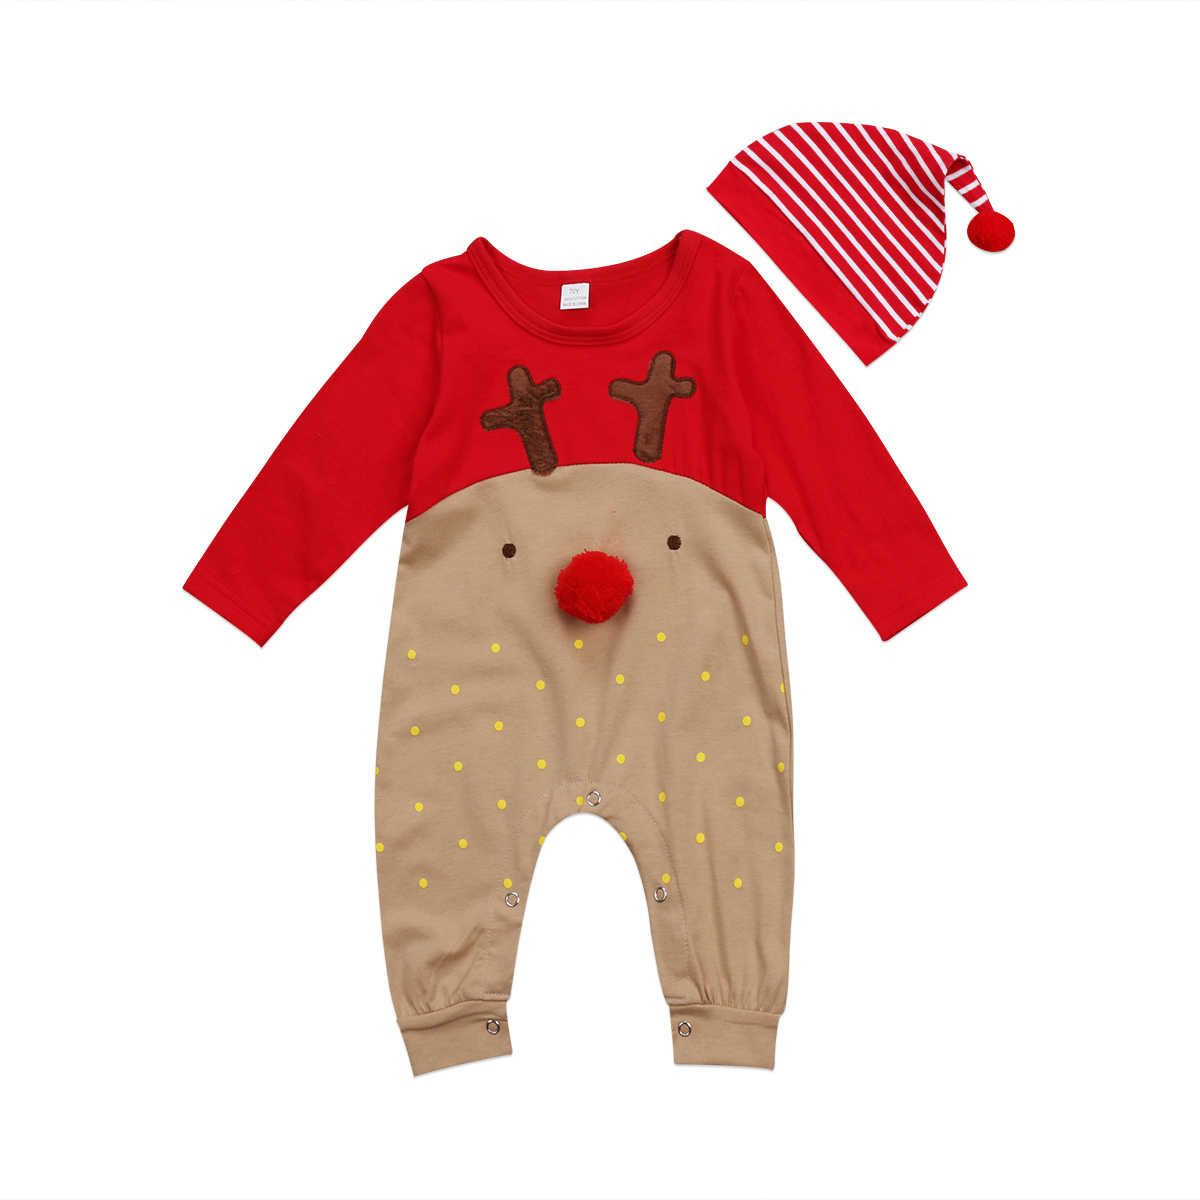 27769f7a631 Newborn Infant Baby Boys Girls Christmas Romper Jumpsuit Bodysuit Cotton Outfits  Clothes Hats Sets 0-